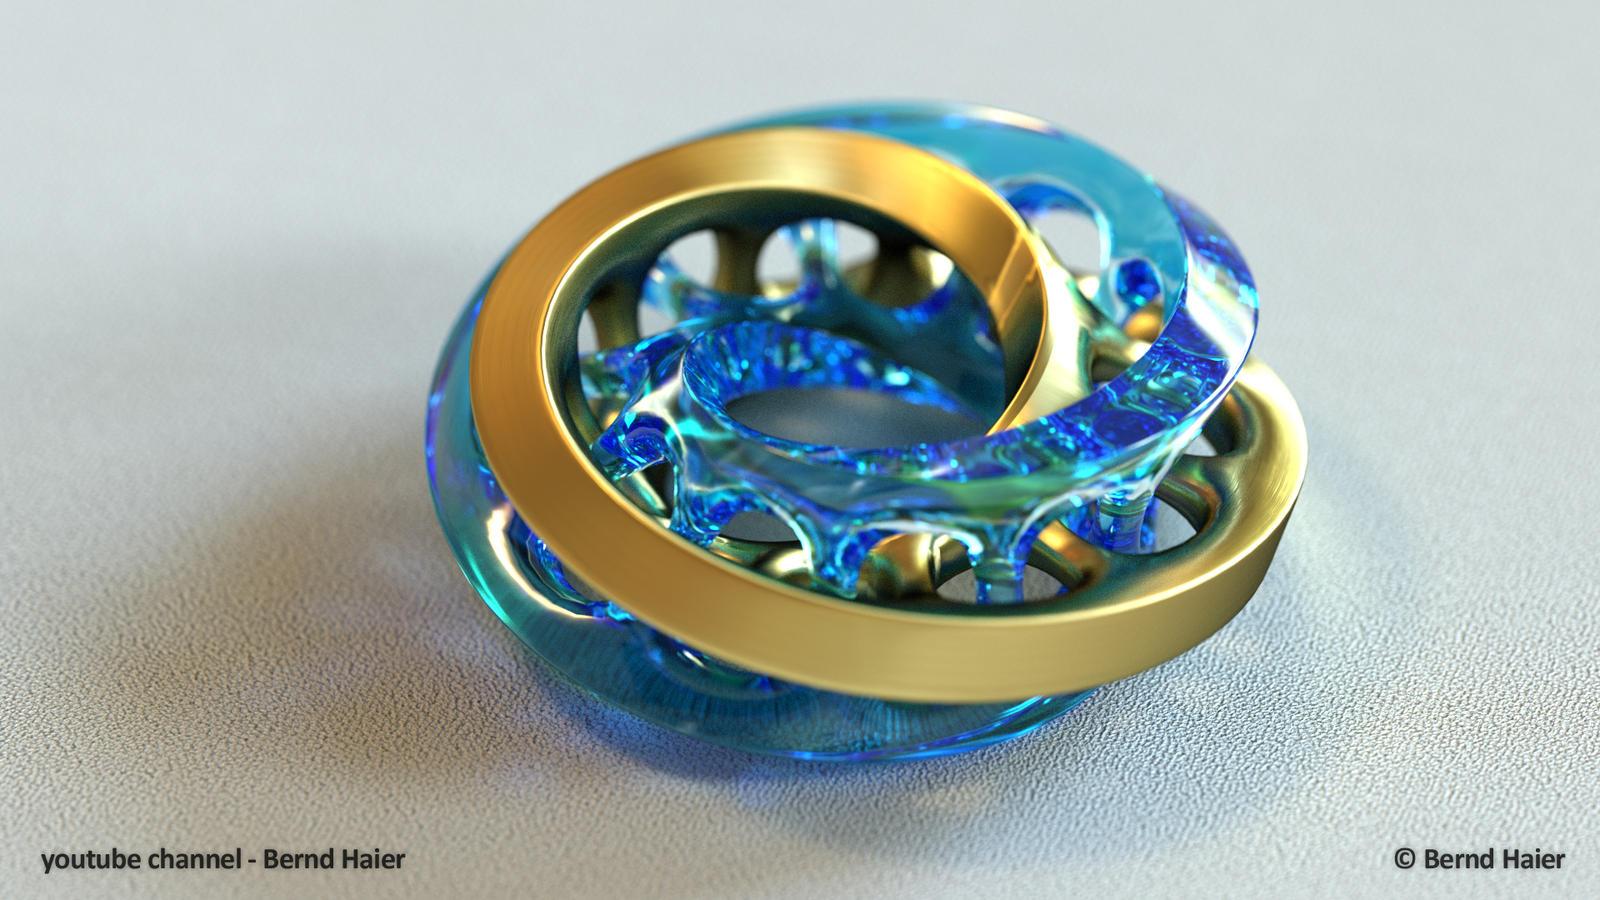 jewelry design part 2 (moebius ring part 1) mat 3 by Bernd ...